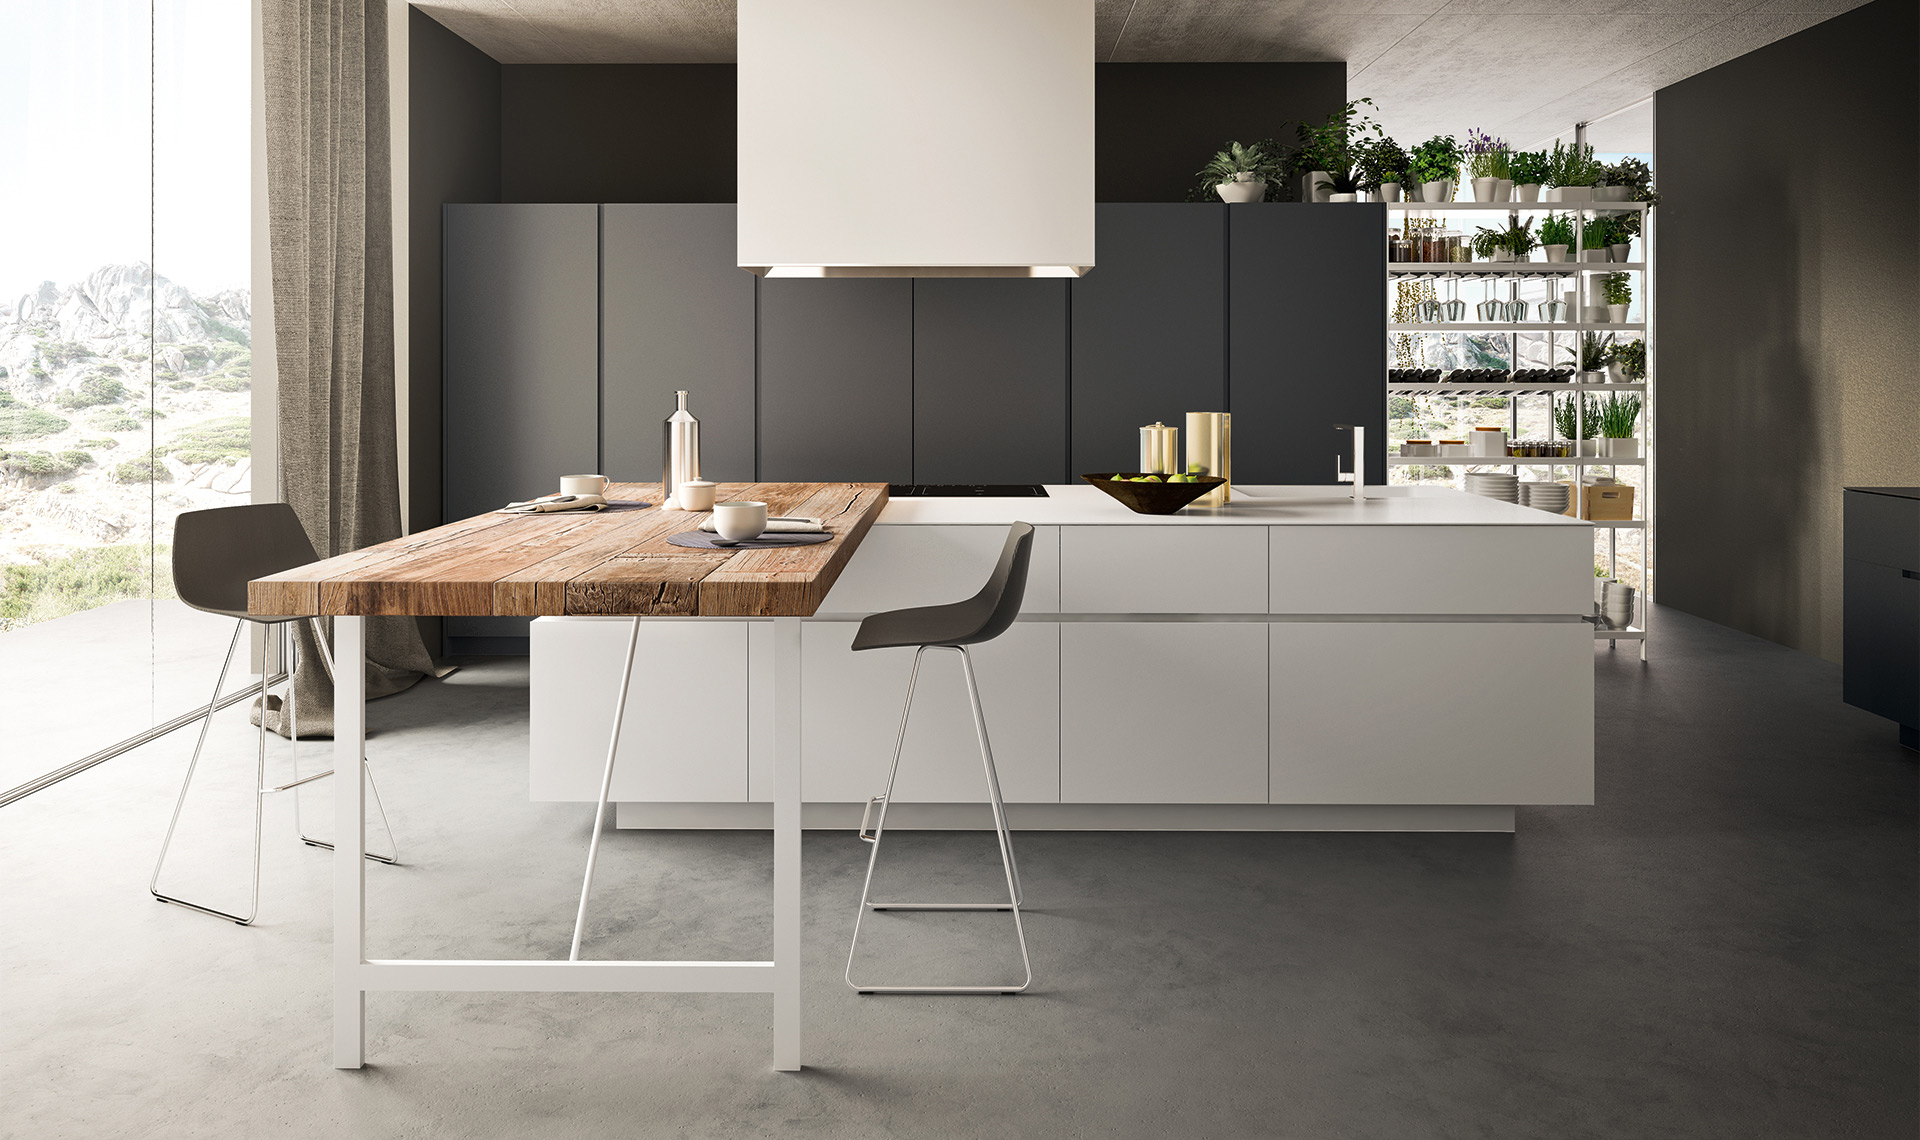 Valdesign realizza cucine moderne cucine moderne di alta for Visma arredo group